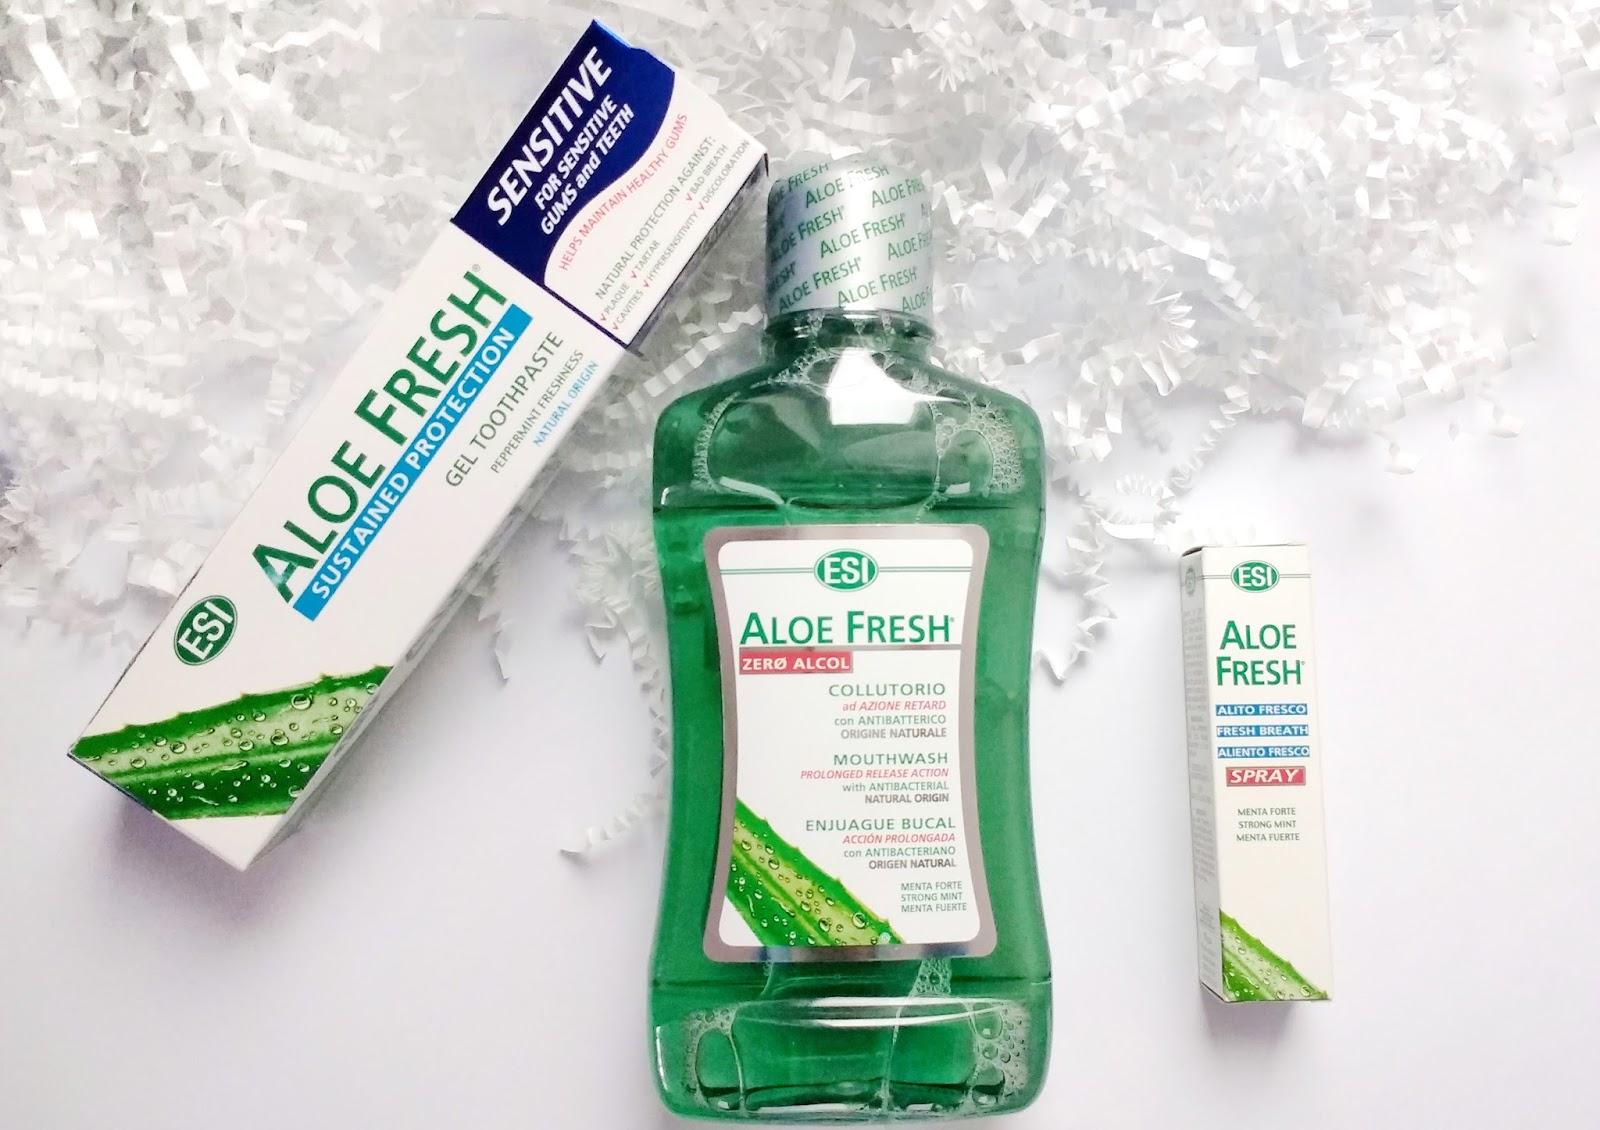 Aloe Fresh | Naturalne produkty z aloesem | Higiena jamy ustnej